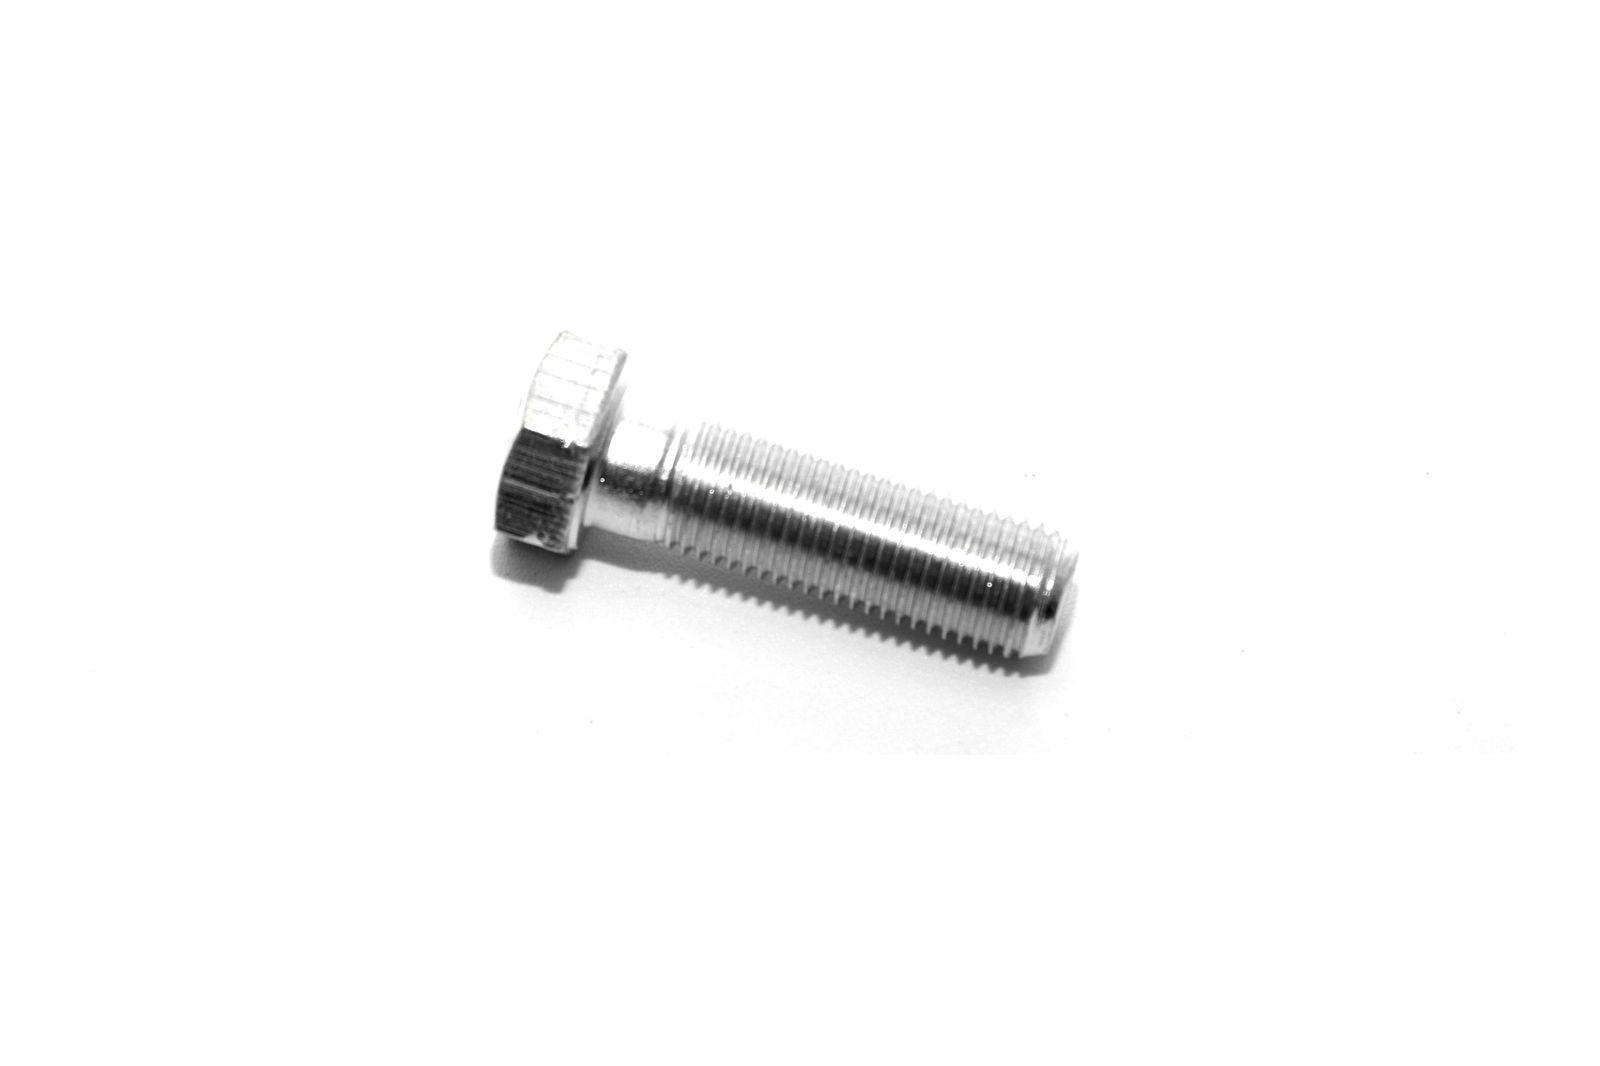 "#1002-35 Bolzen UNF 3/8"" x 1 1/4"", BH606101"